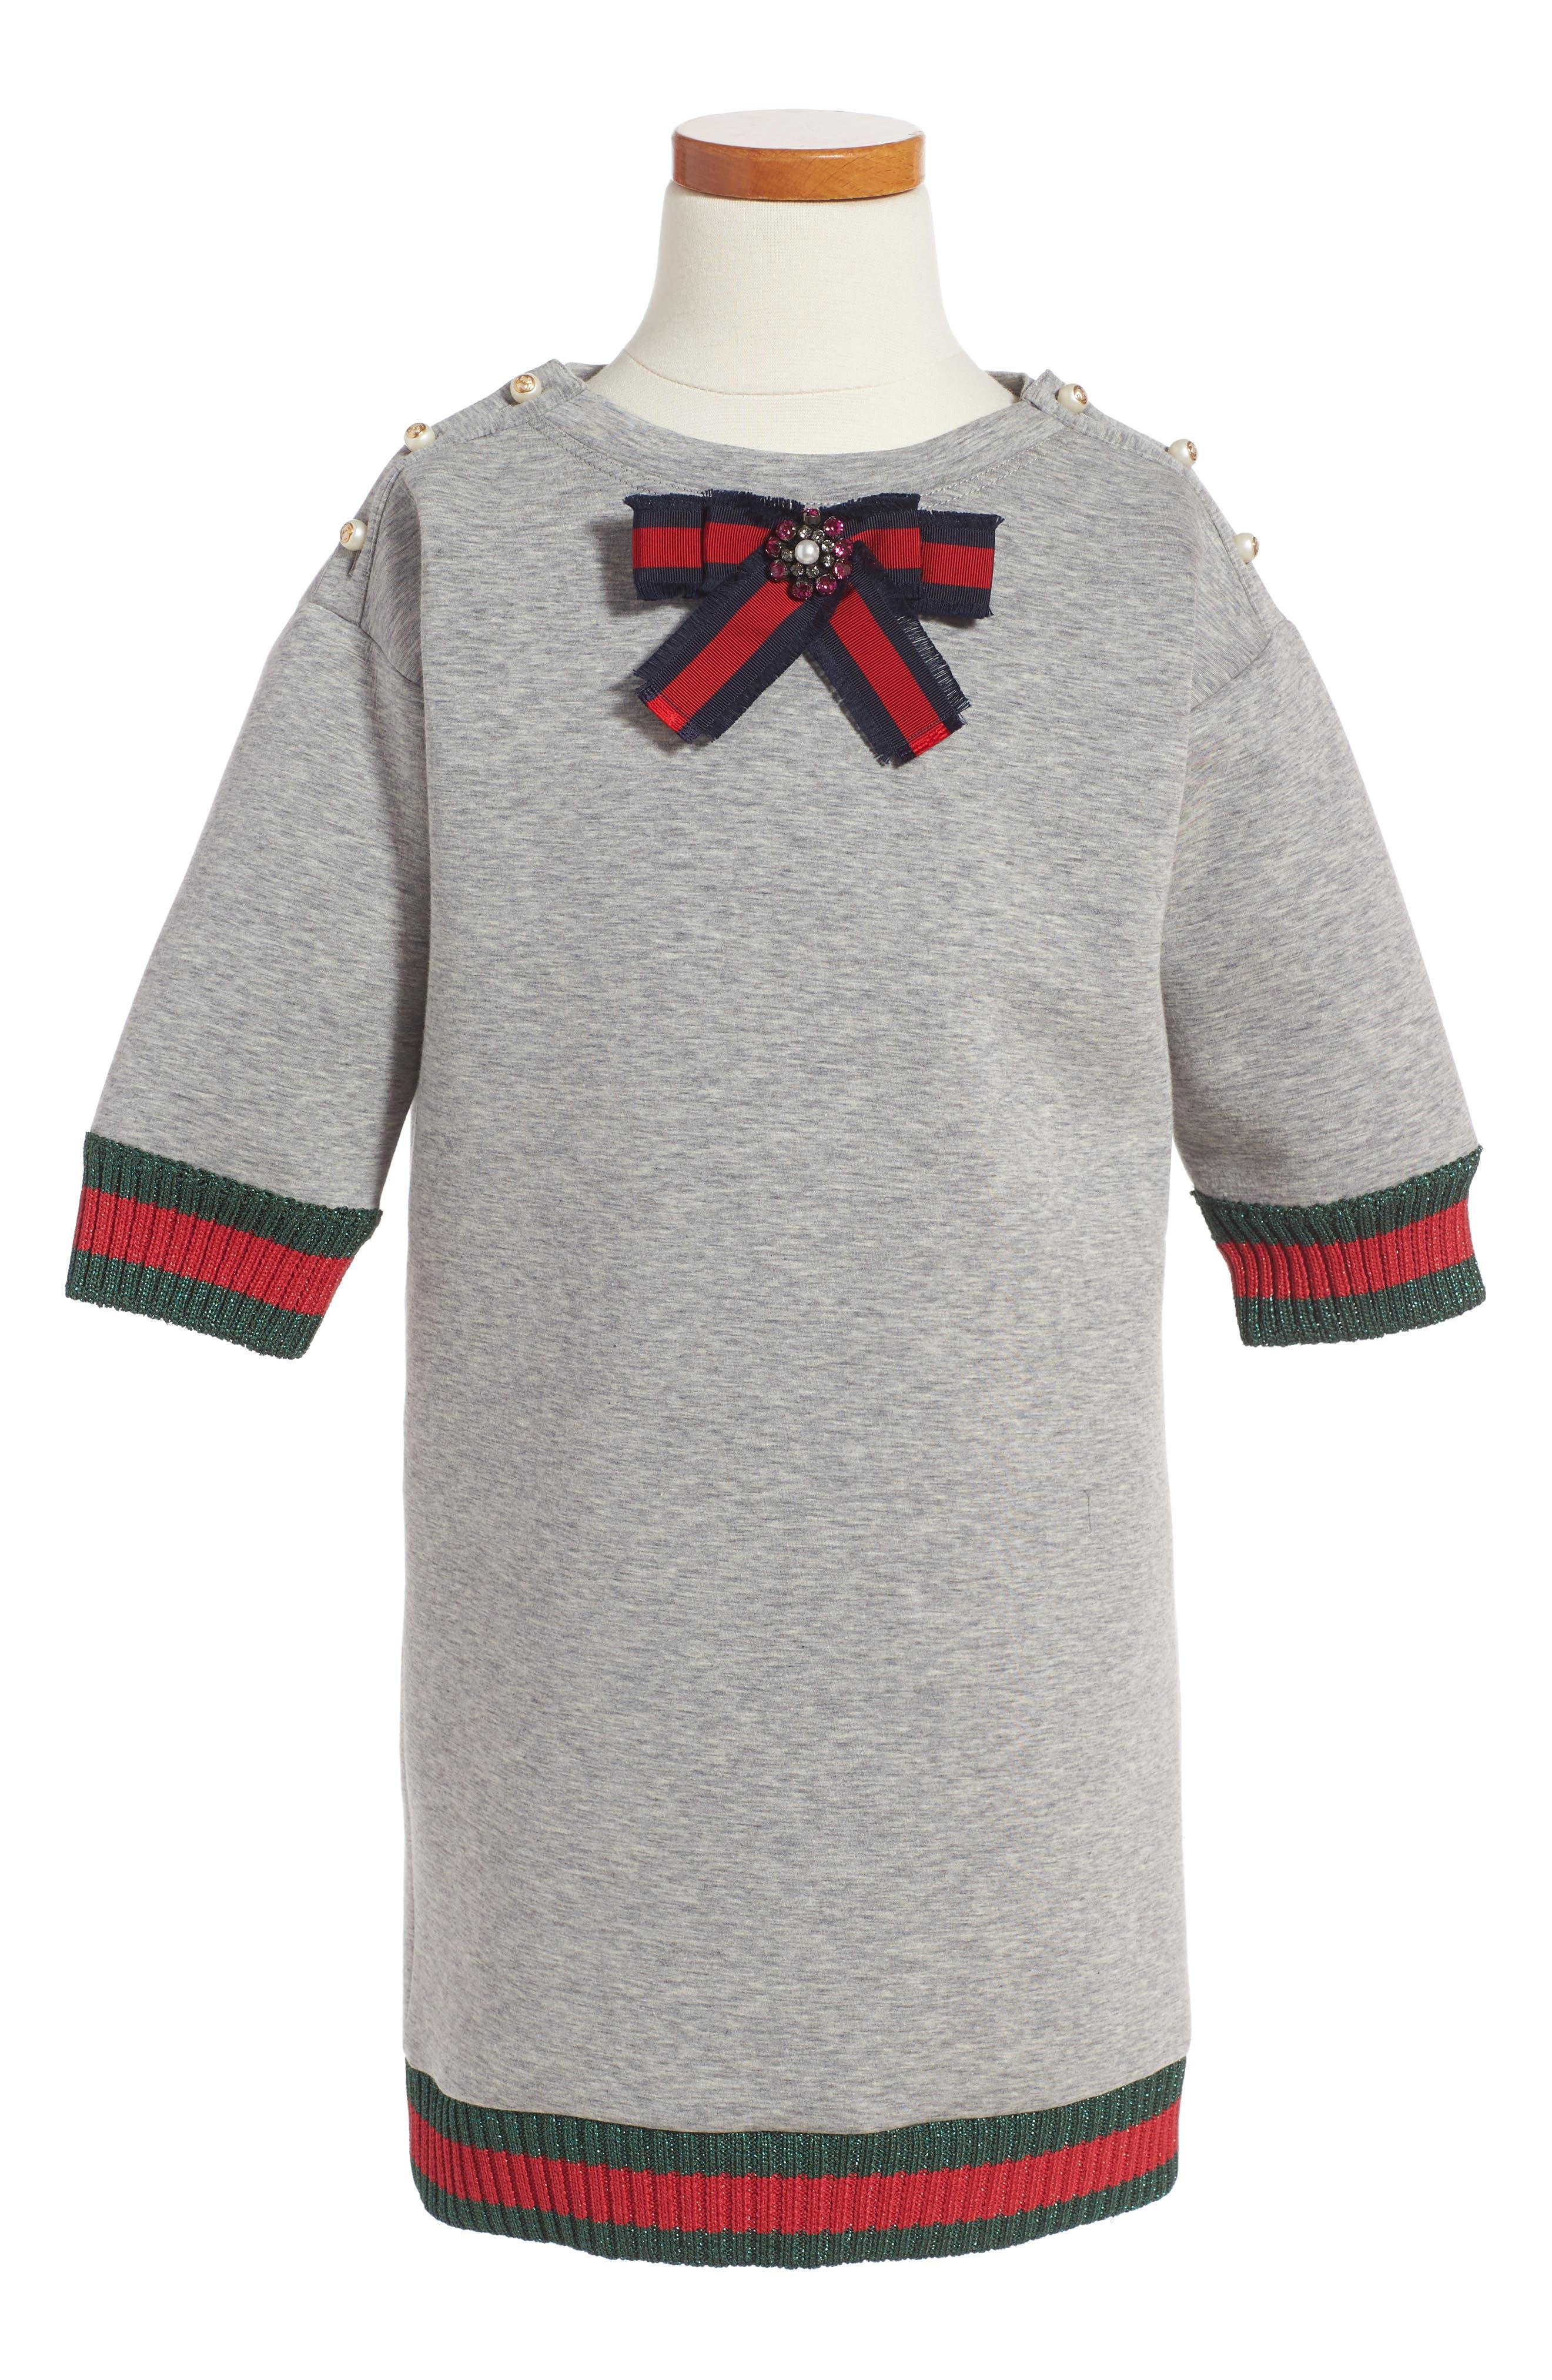 b0e6f4686 Gucci Kids - Girls Dresses